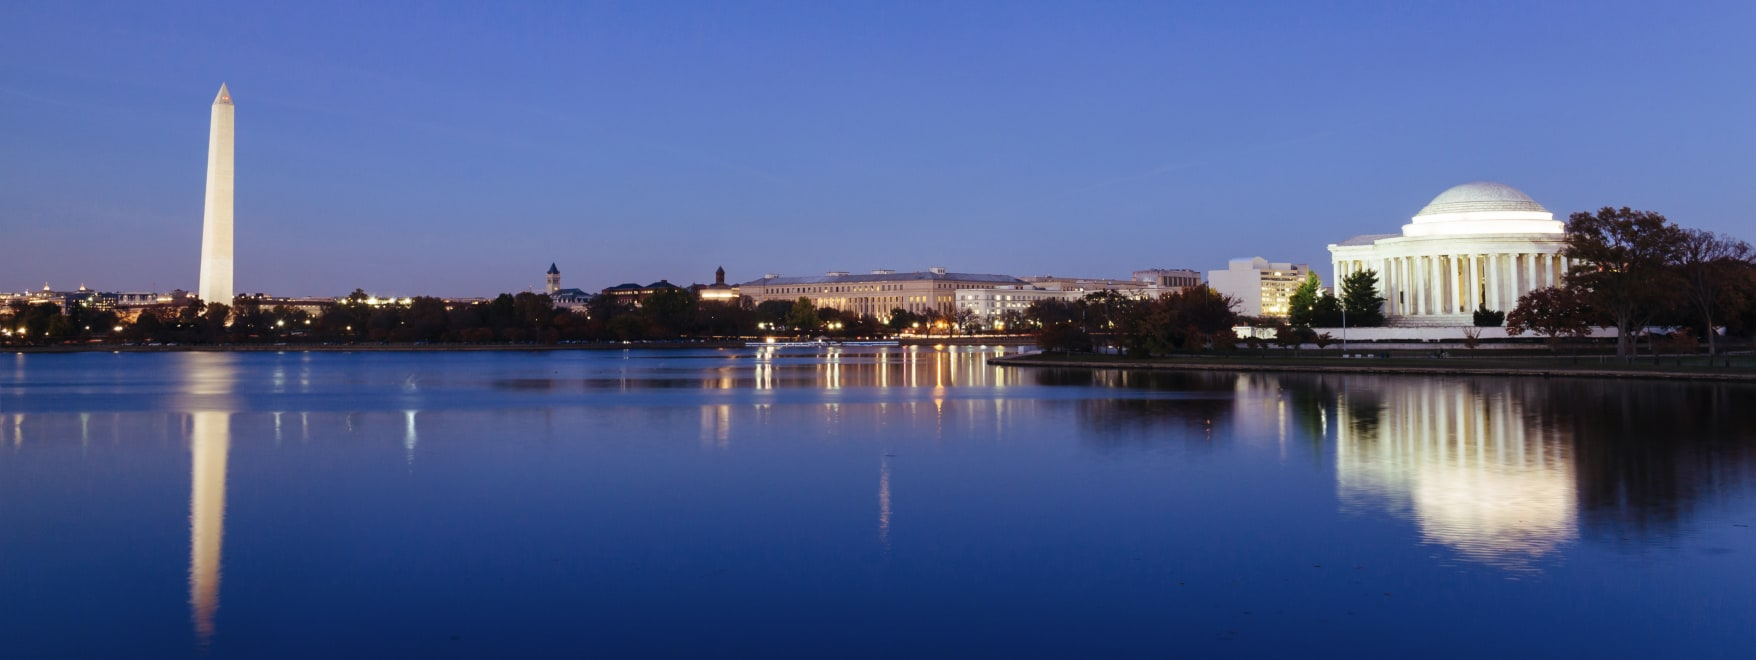 Washington D.C. Data Centers